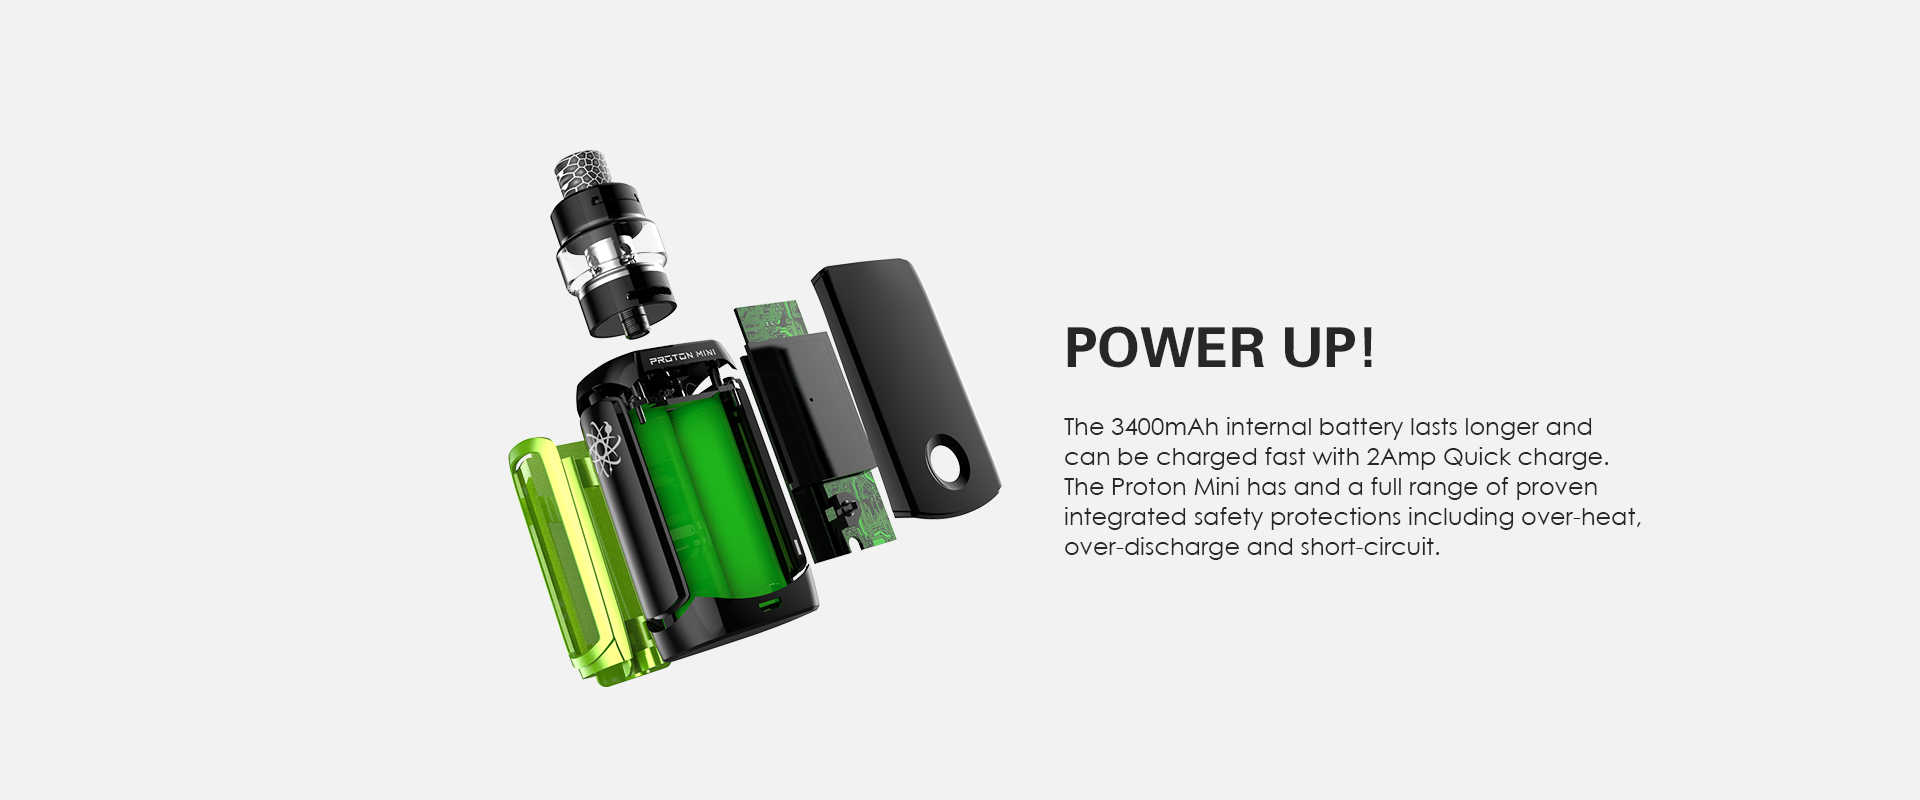 Innokin Proton Mini Ajax Kit Feature 8